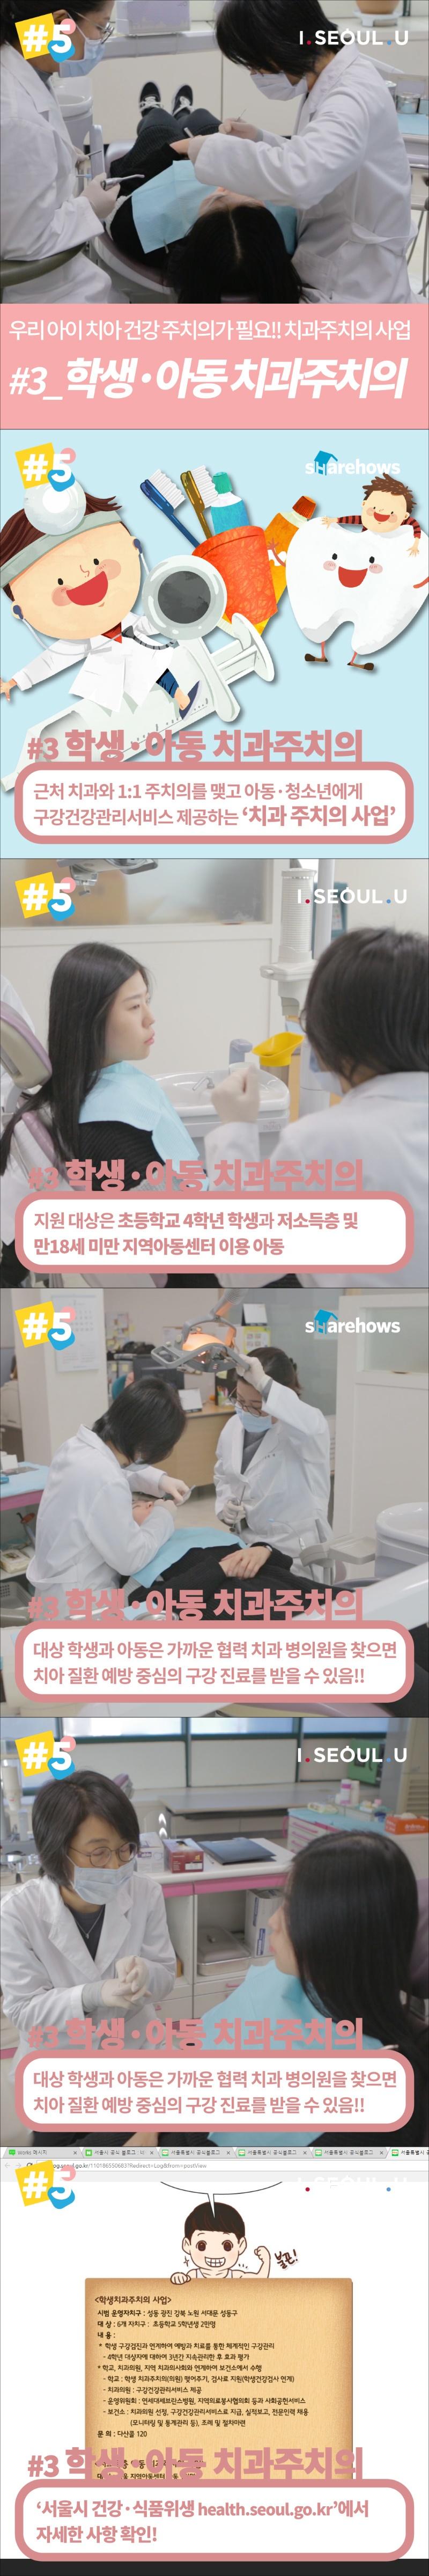 Medical service 03